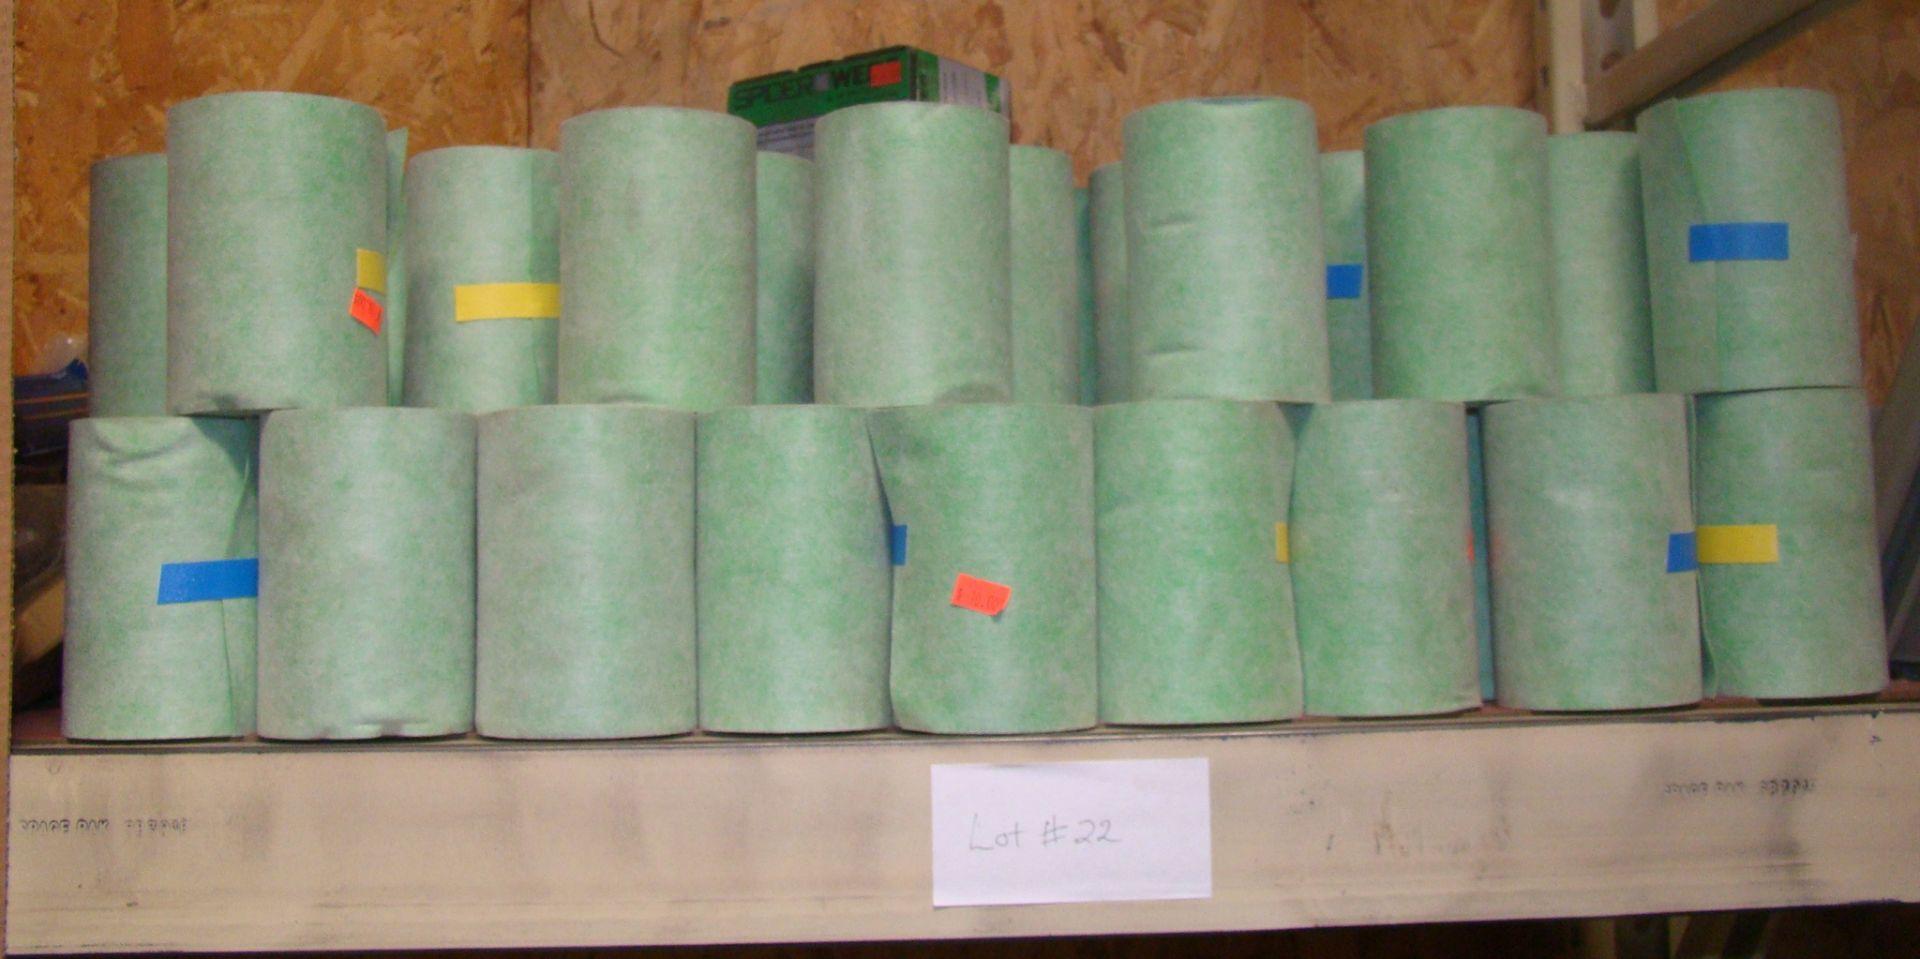 "Lot 22 - 114 Spider Web Seam Tape 4.5"" x 16.25'"